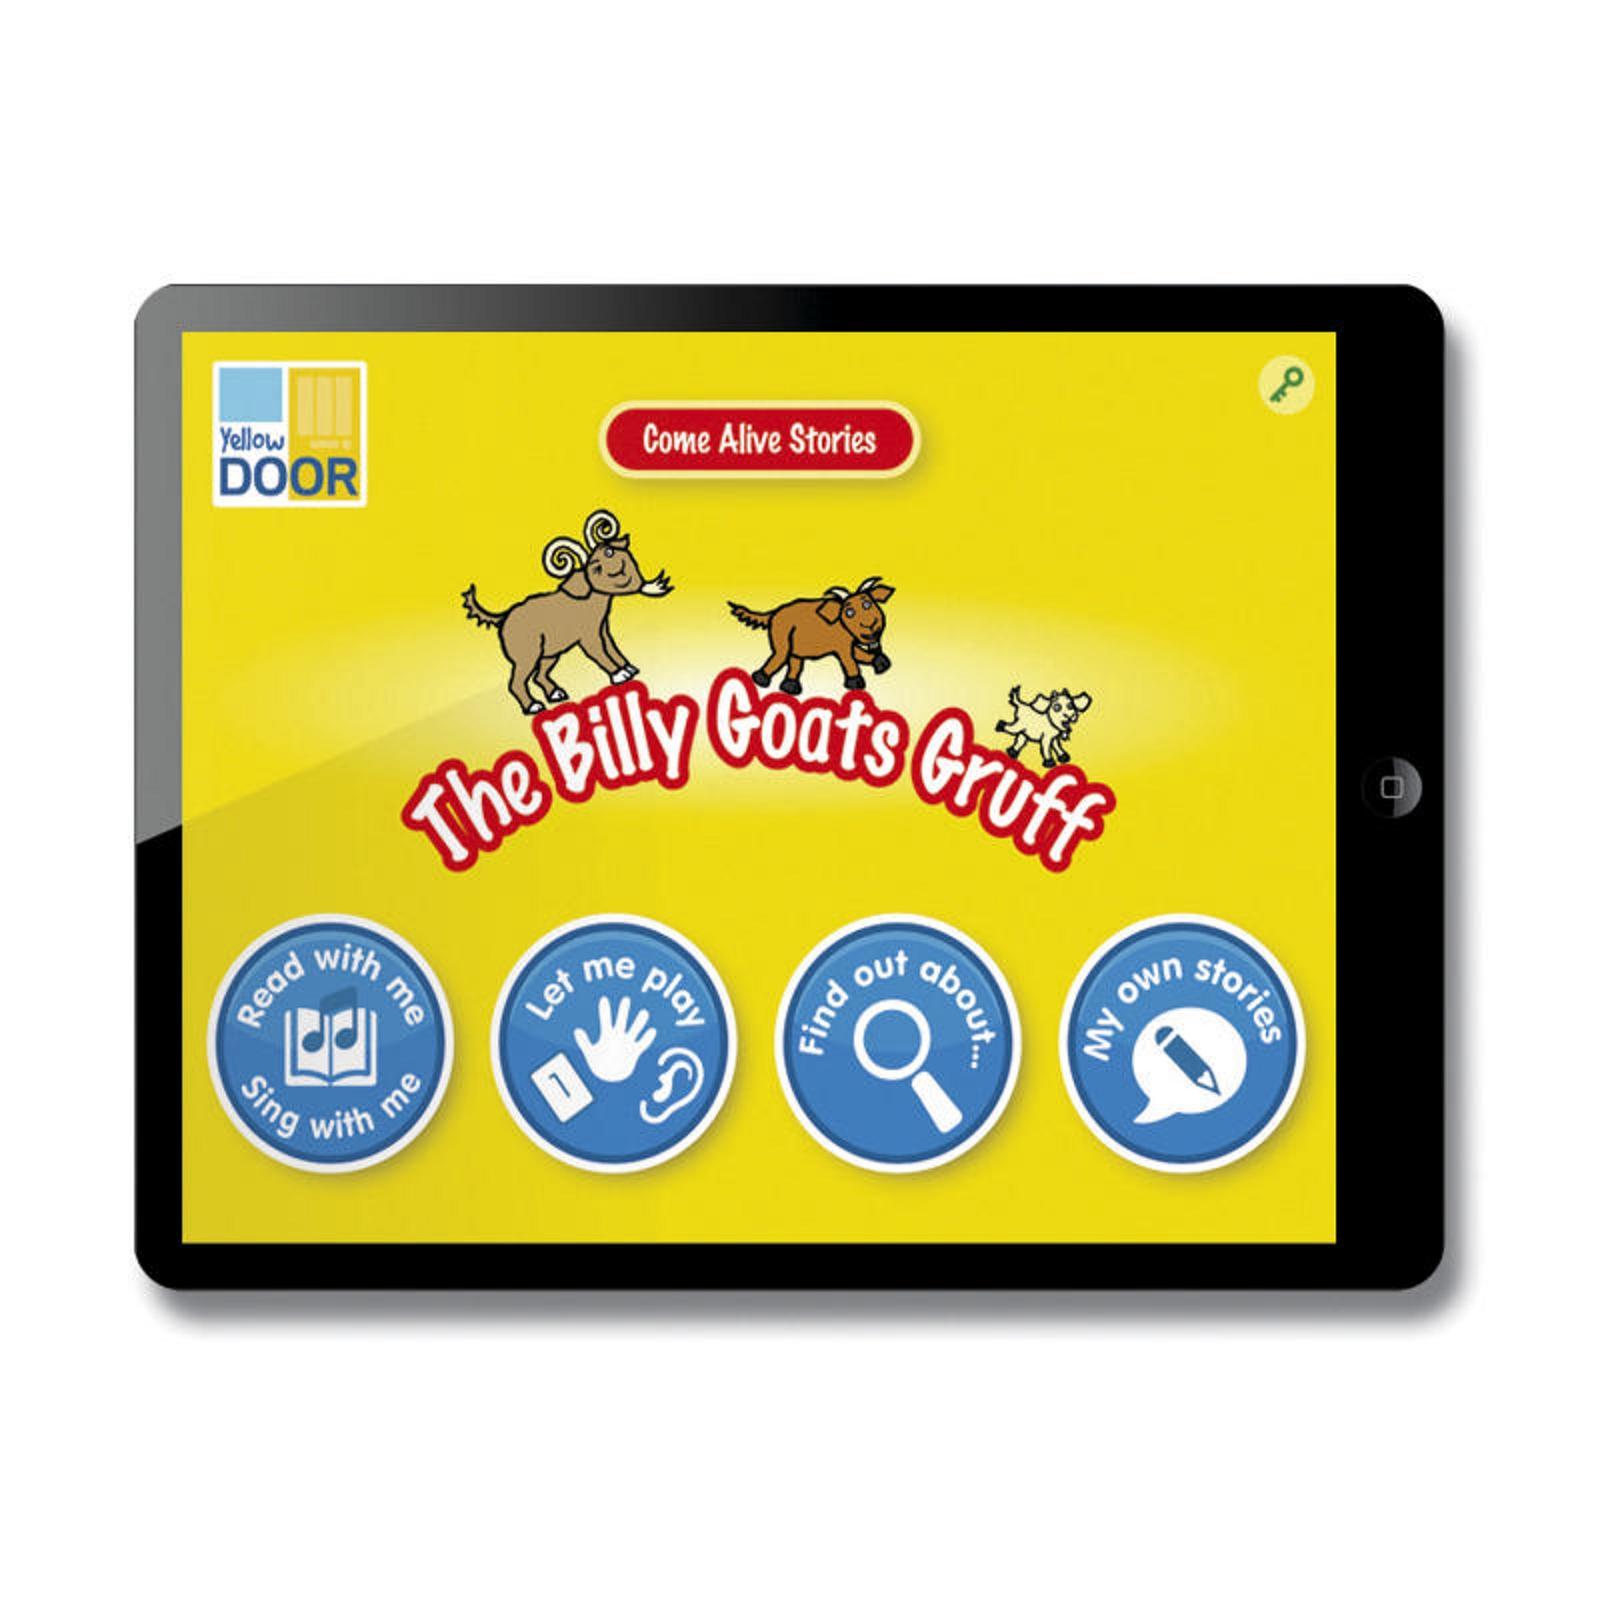 The Billy Goats Gruff App - Single